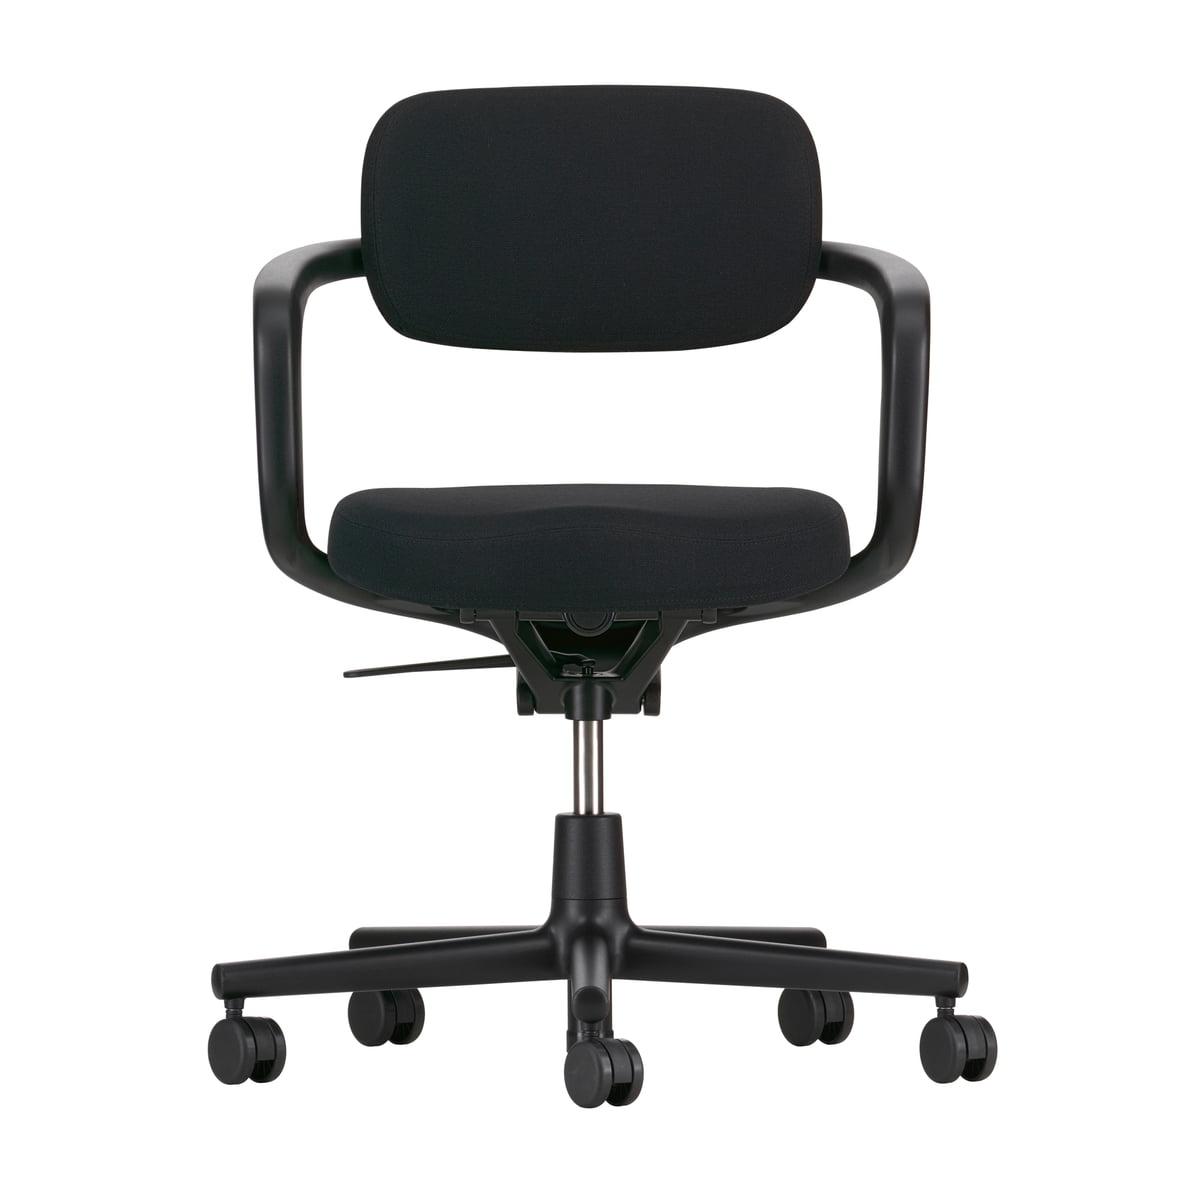 Bürostuhl Designklassiker Vitra allstar bürostuhl vitra im shop